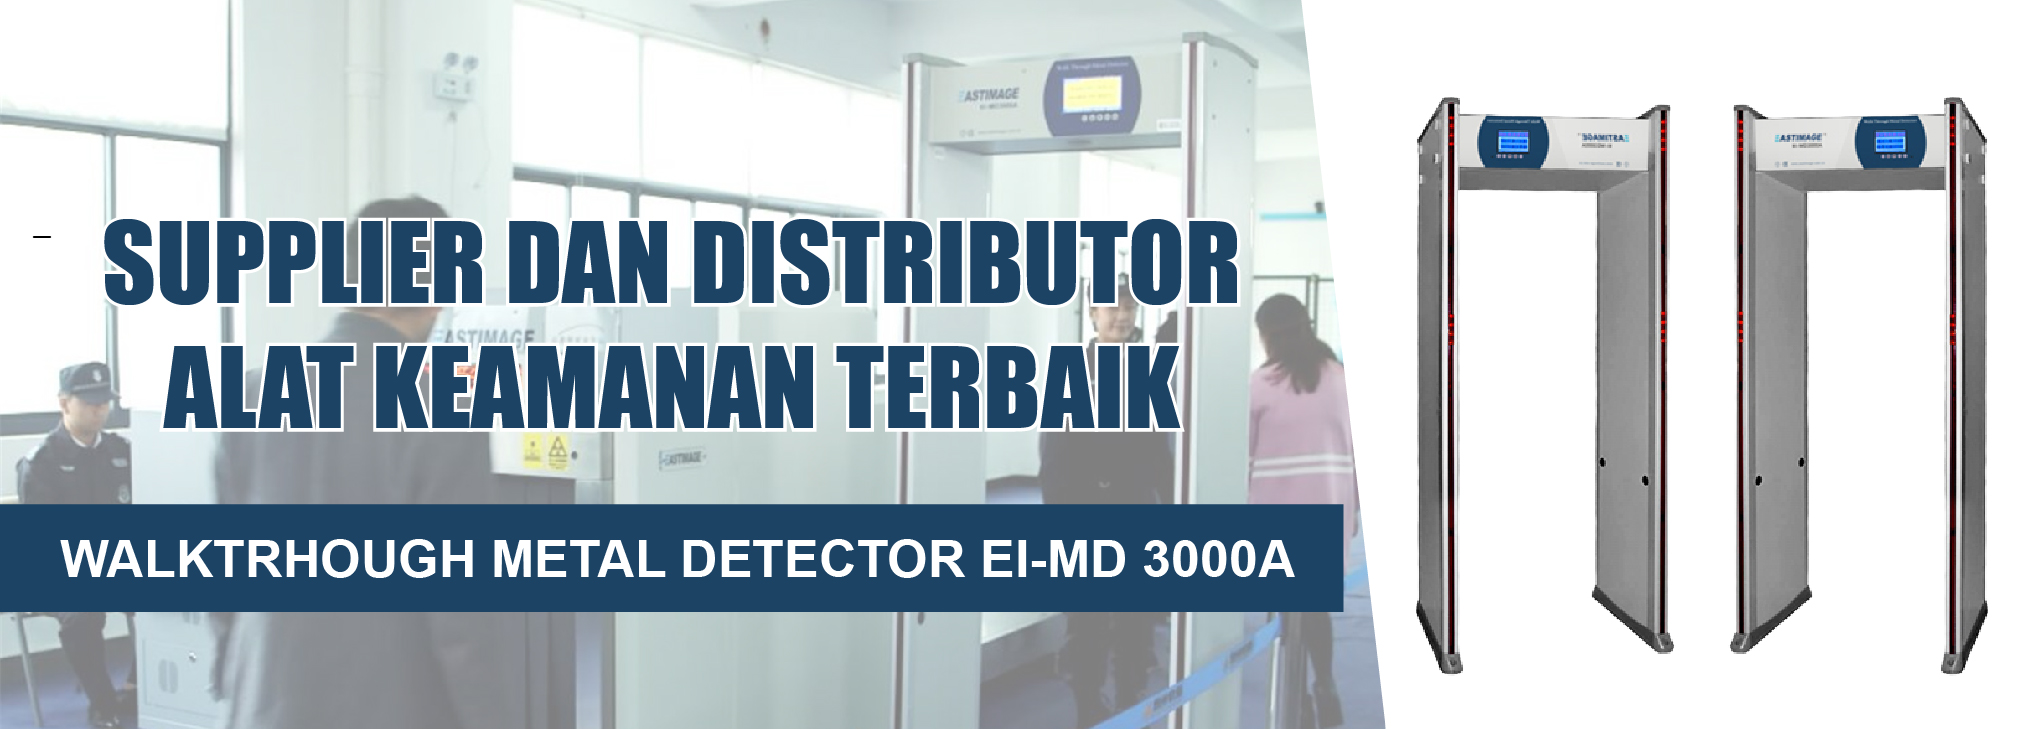 Walkthrough Metal Detector EI-MD3000A